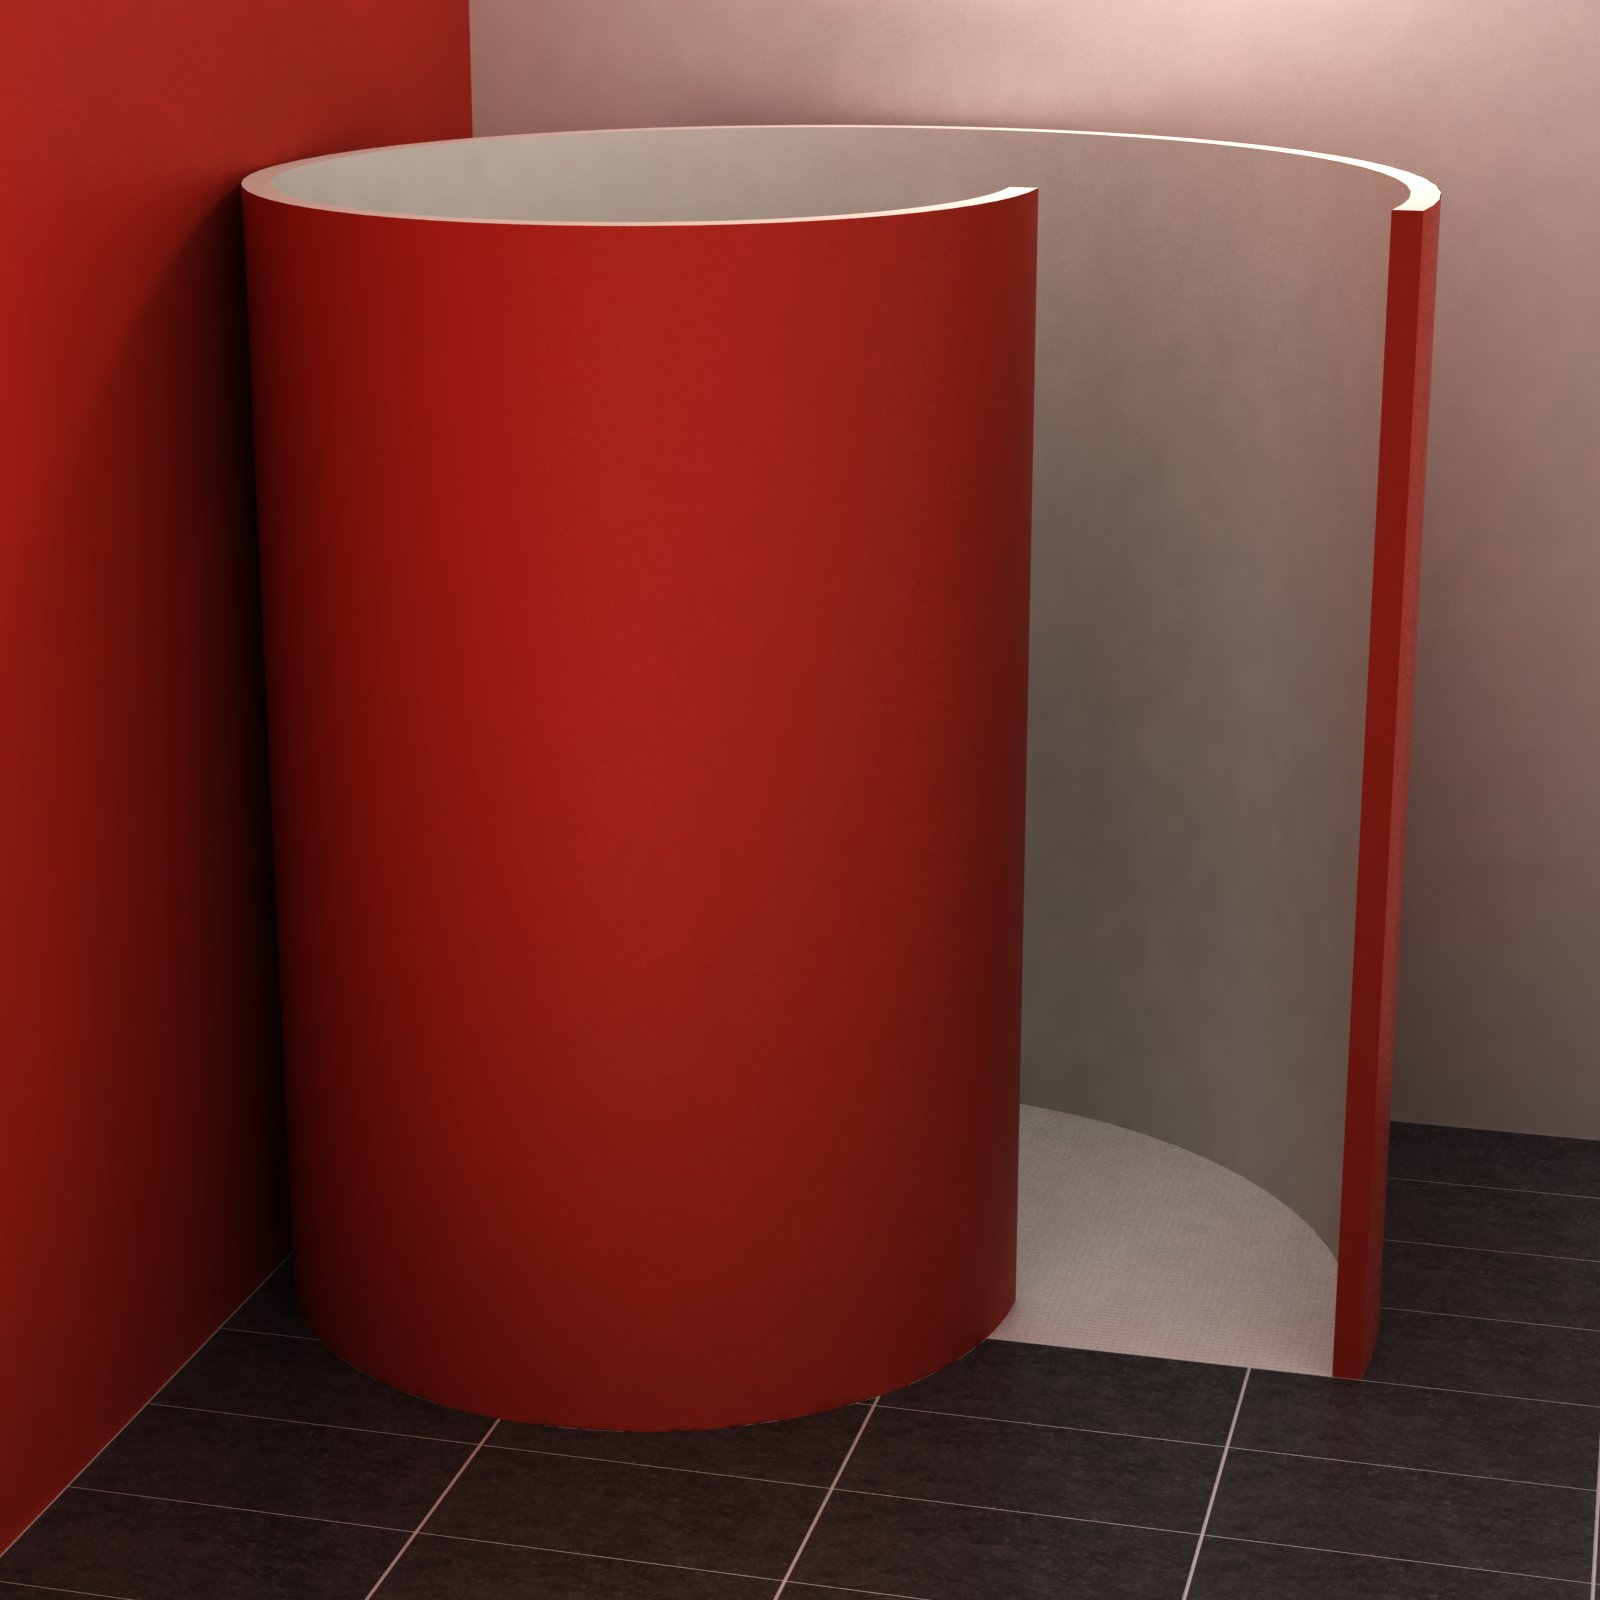 schneckendusche 150x117 5 cm schneckendusche befliesbar duschkabinen duschw nde. Black Bedroom Furniture Sets. Home Design Ideas